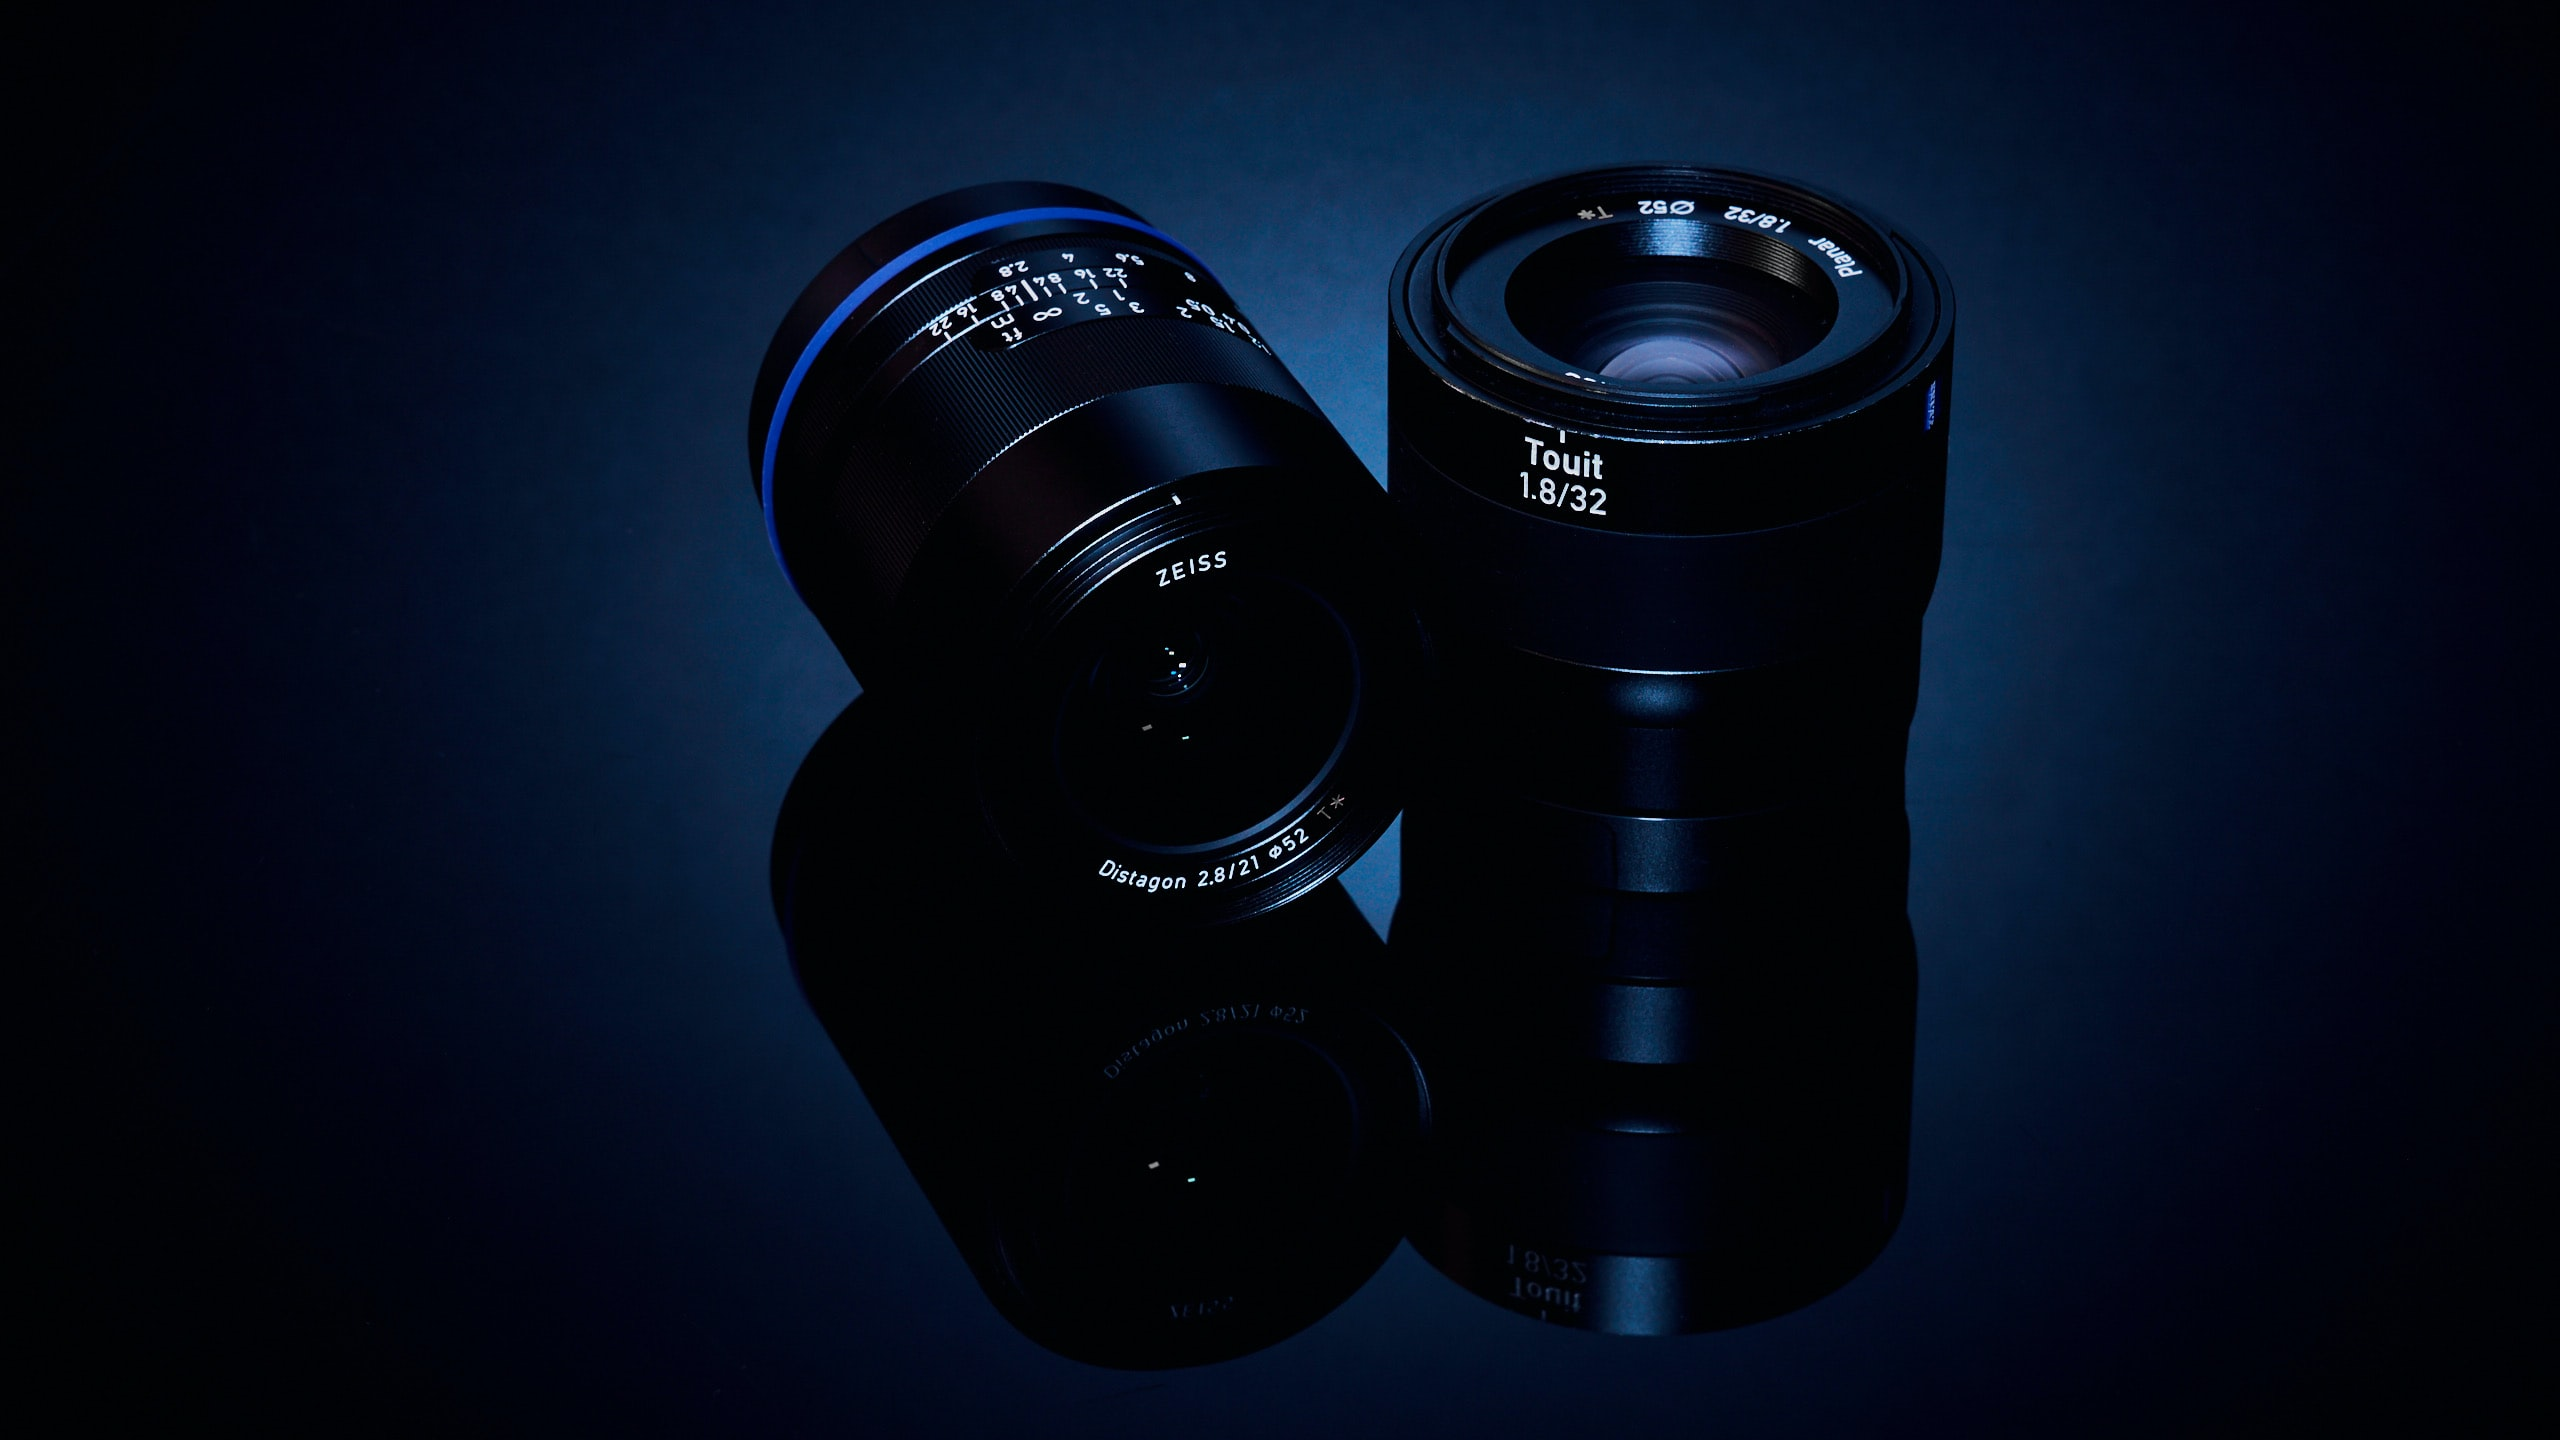 two black telephoto lens